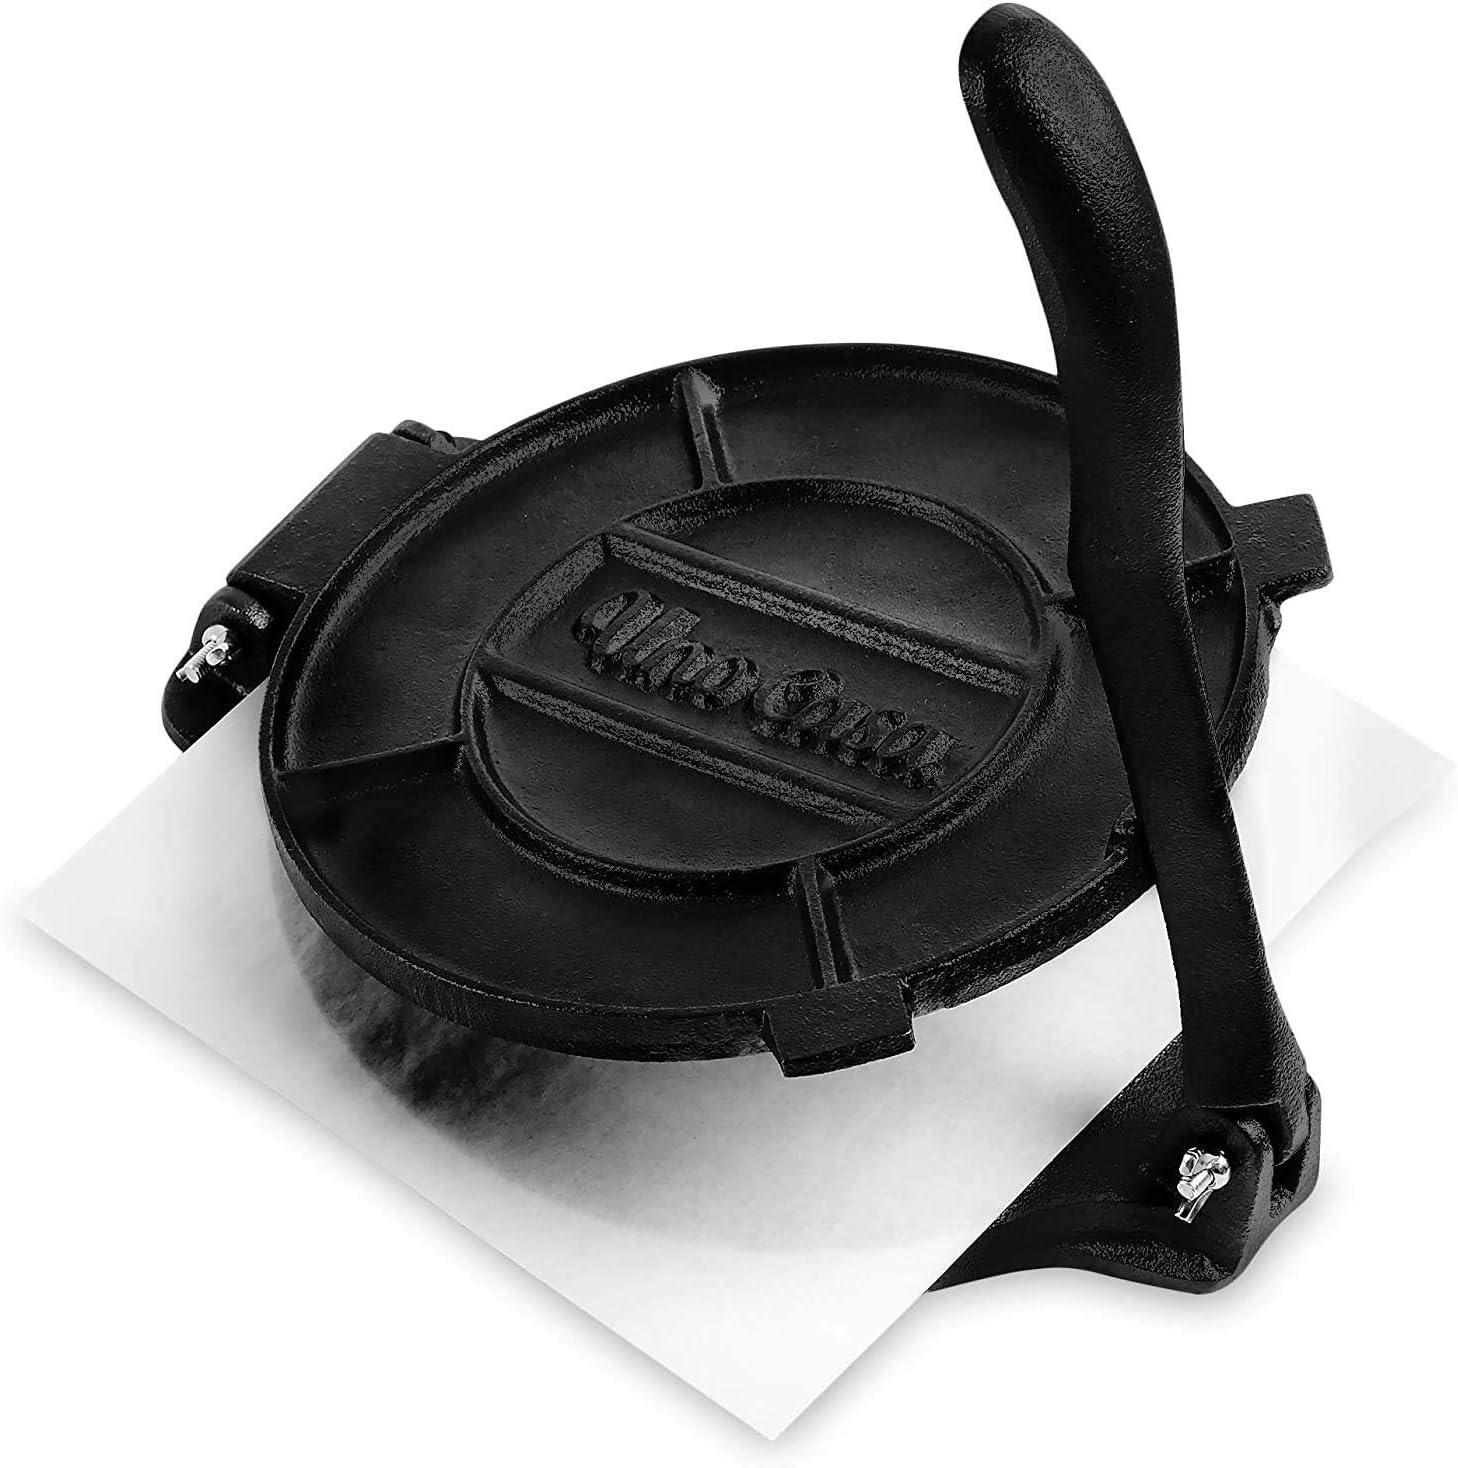 25 Uno Casa Tortilla Presse, Gusseisen, 10,10 cm, Roti und Tortilla Maker –  Bonus 10 Stück Pergamentpapier